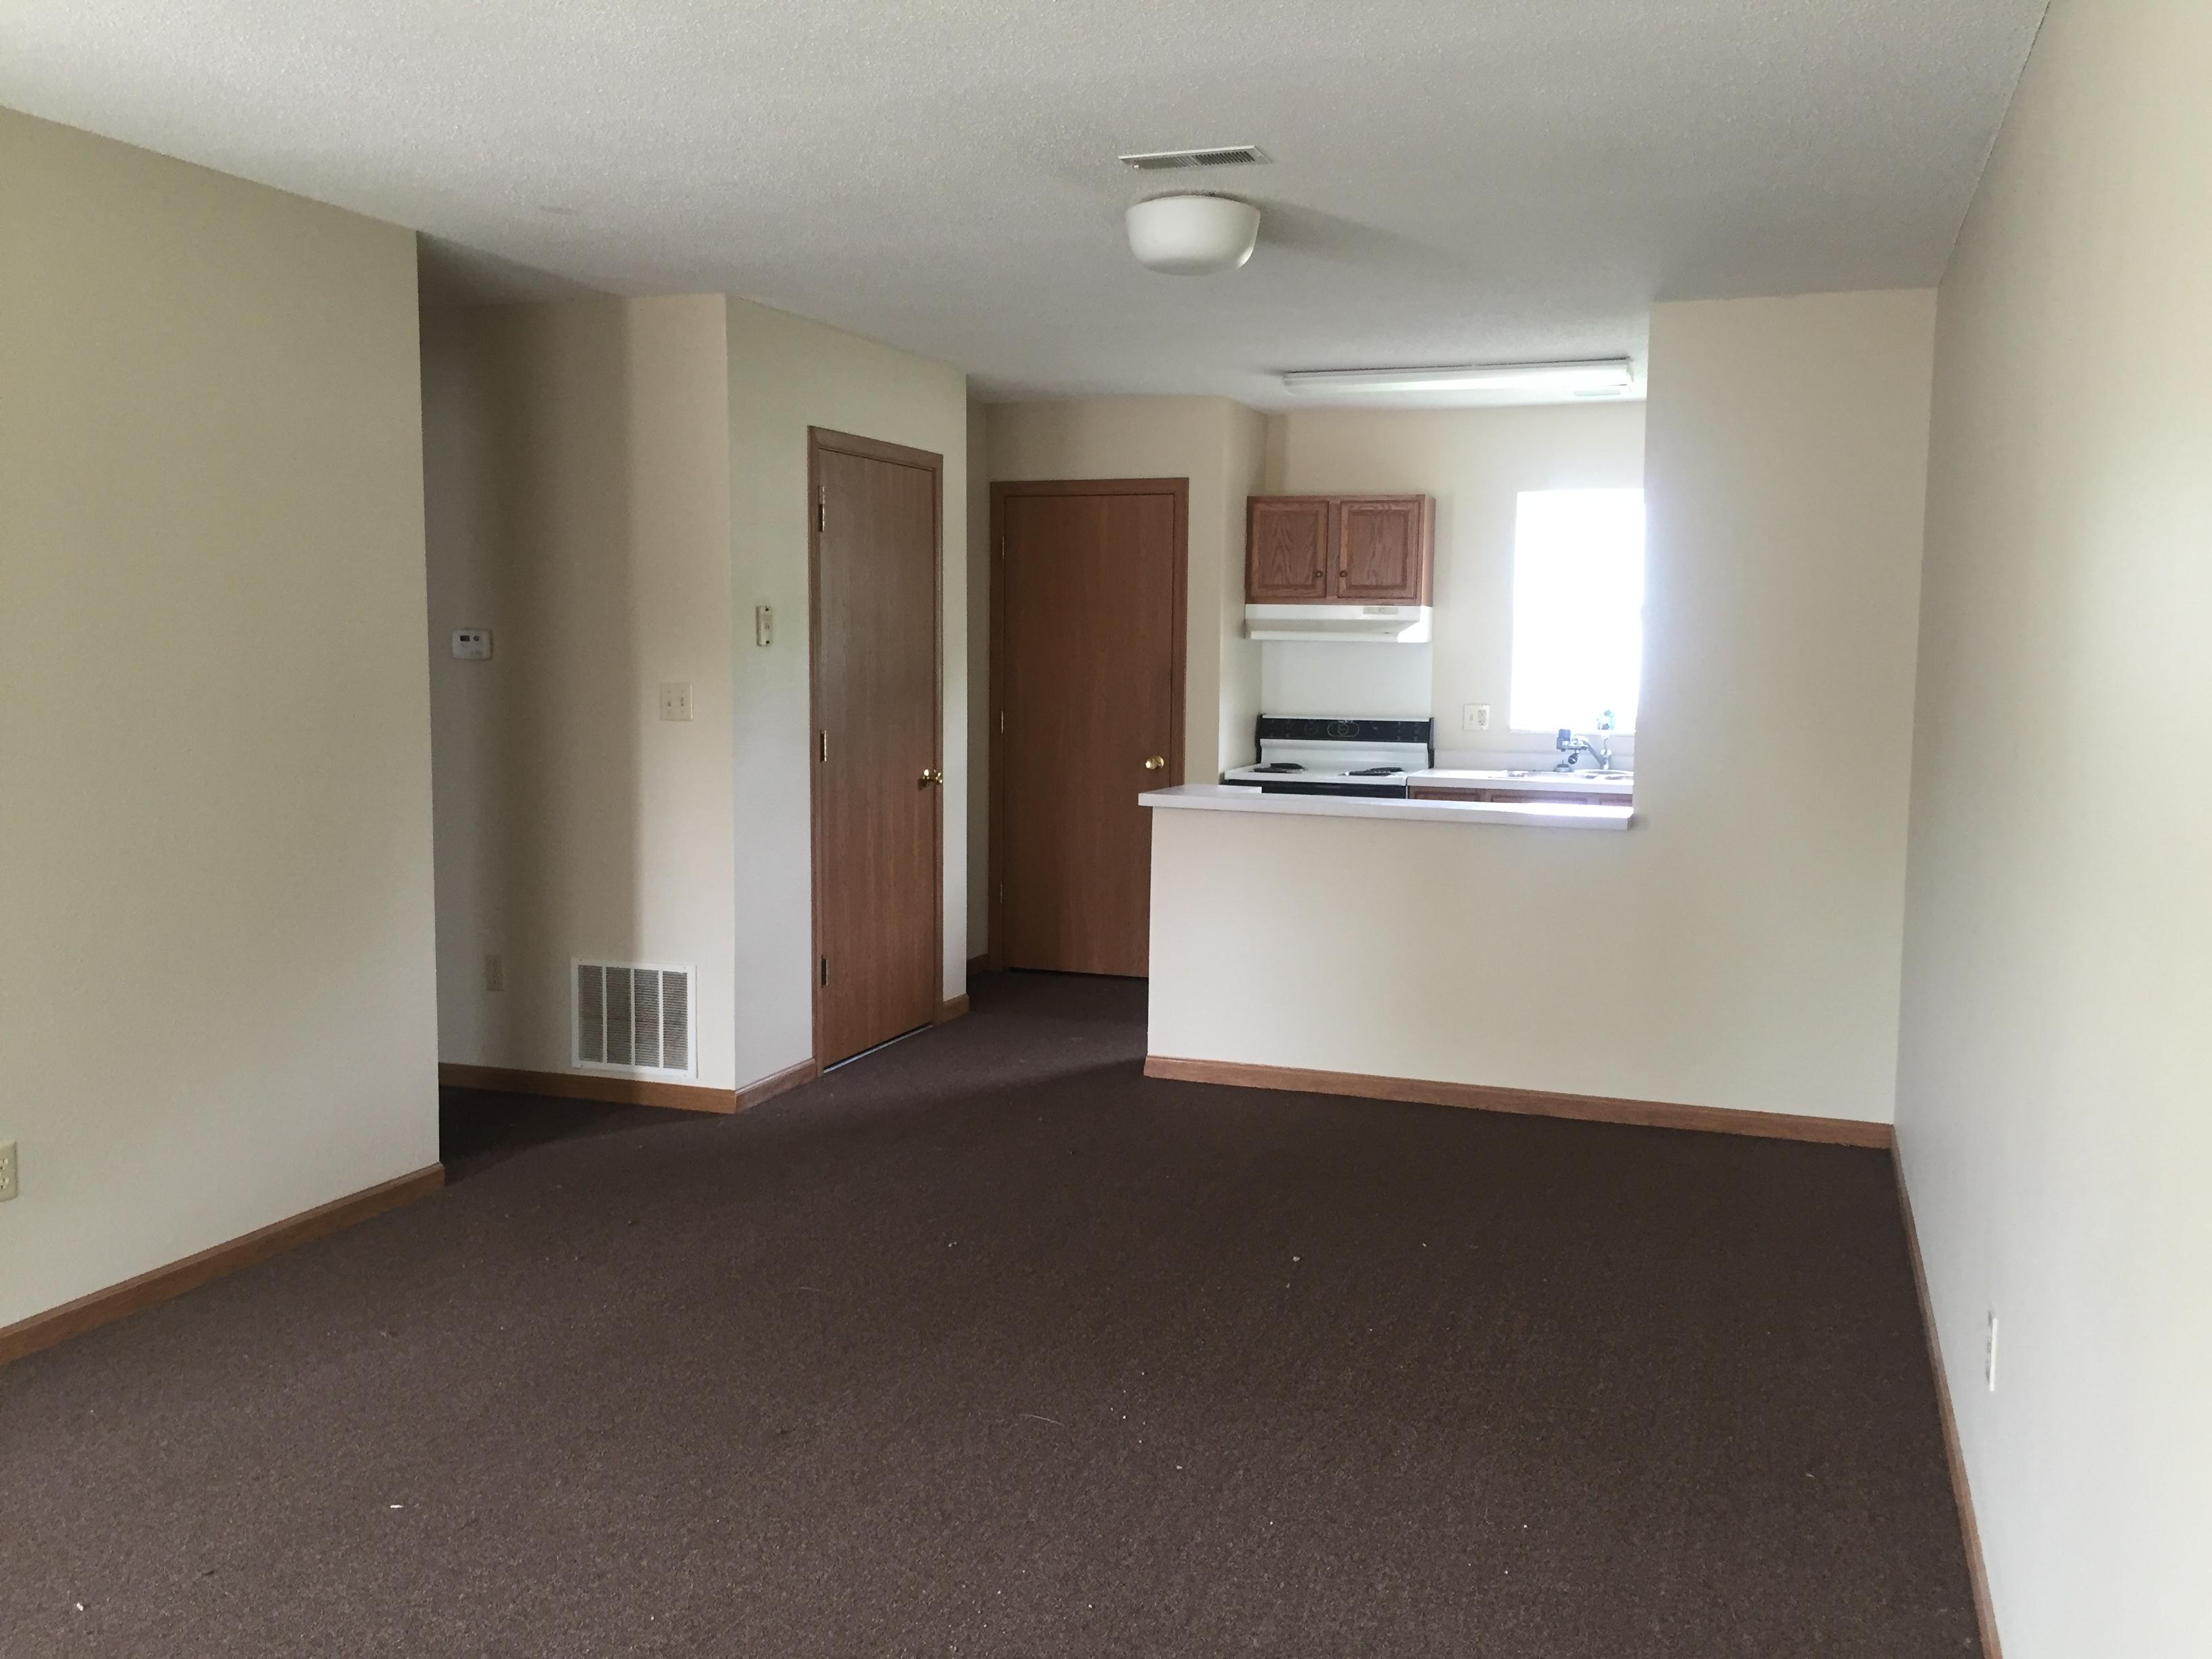 Living Room - Valmeyer Senior Apartments